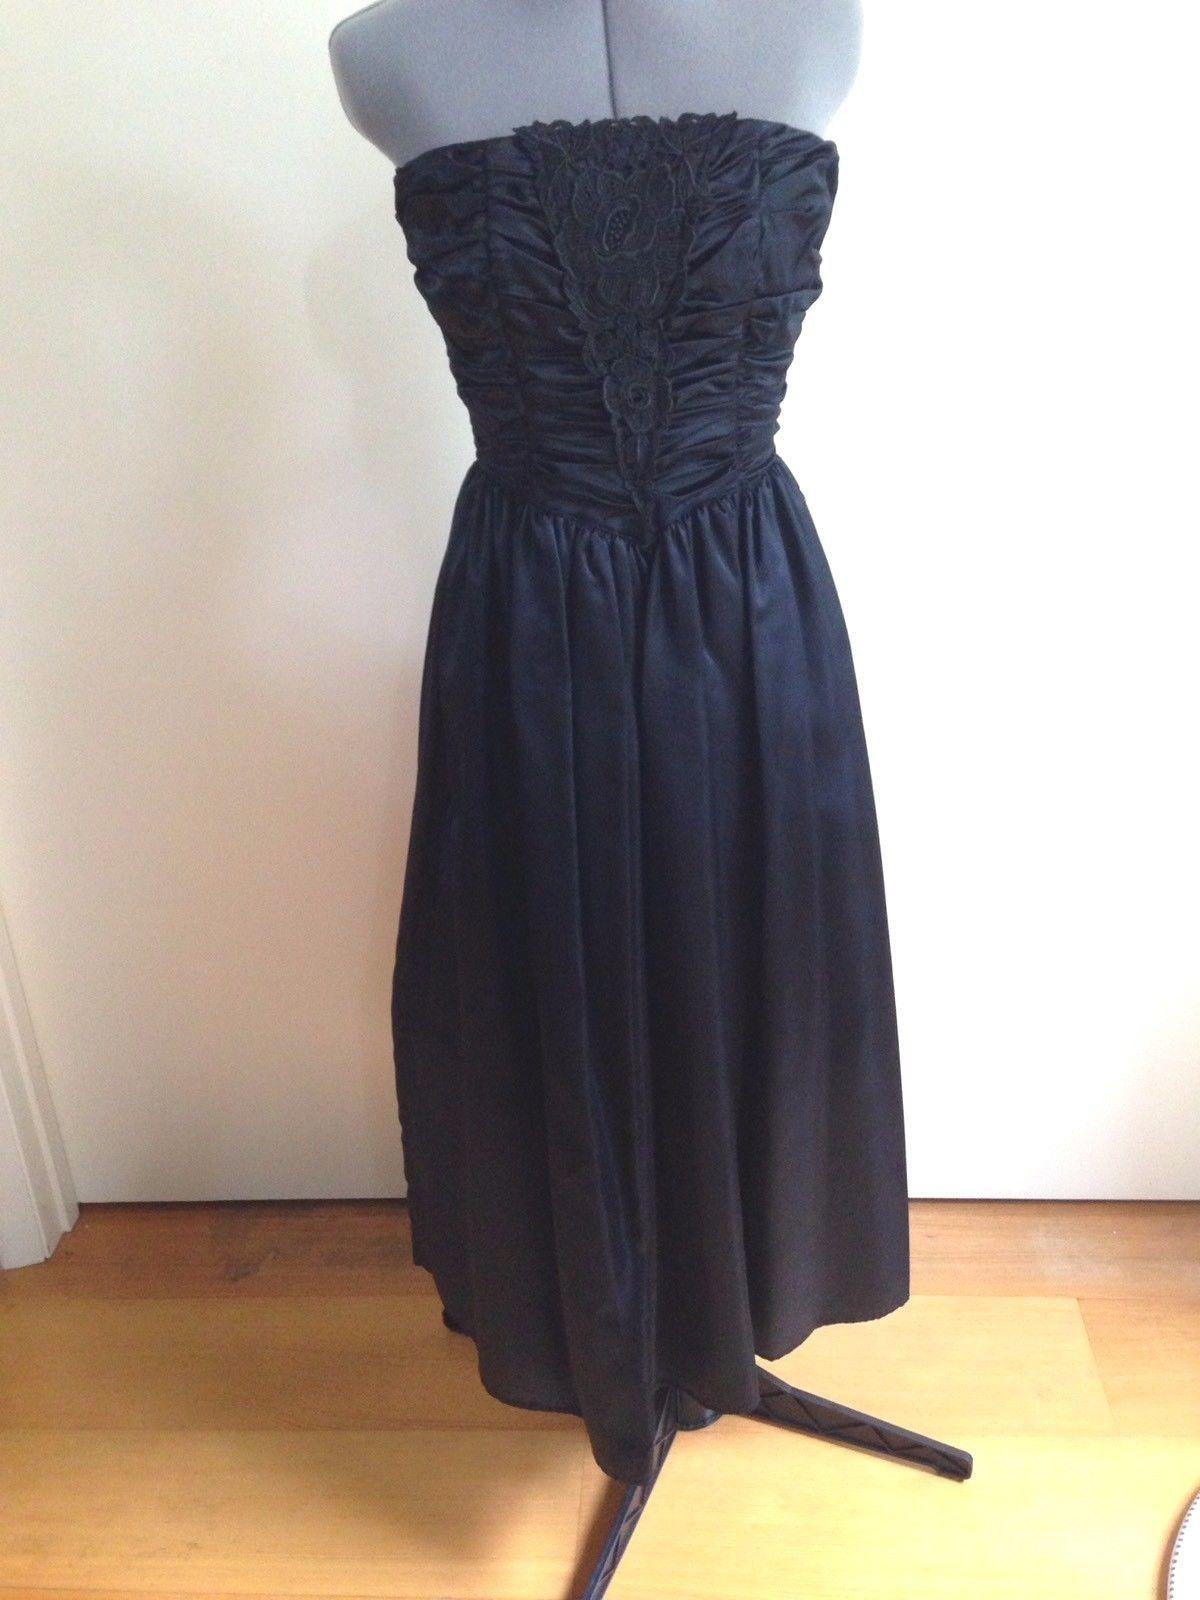 e3fd1d4e16d 57. 57. Previous. Vintage Gunne Sax by Jessica McClintock Black Satin  Strapless Corset Dress Jr 7. Vintage ...